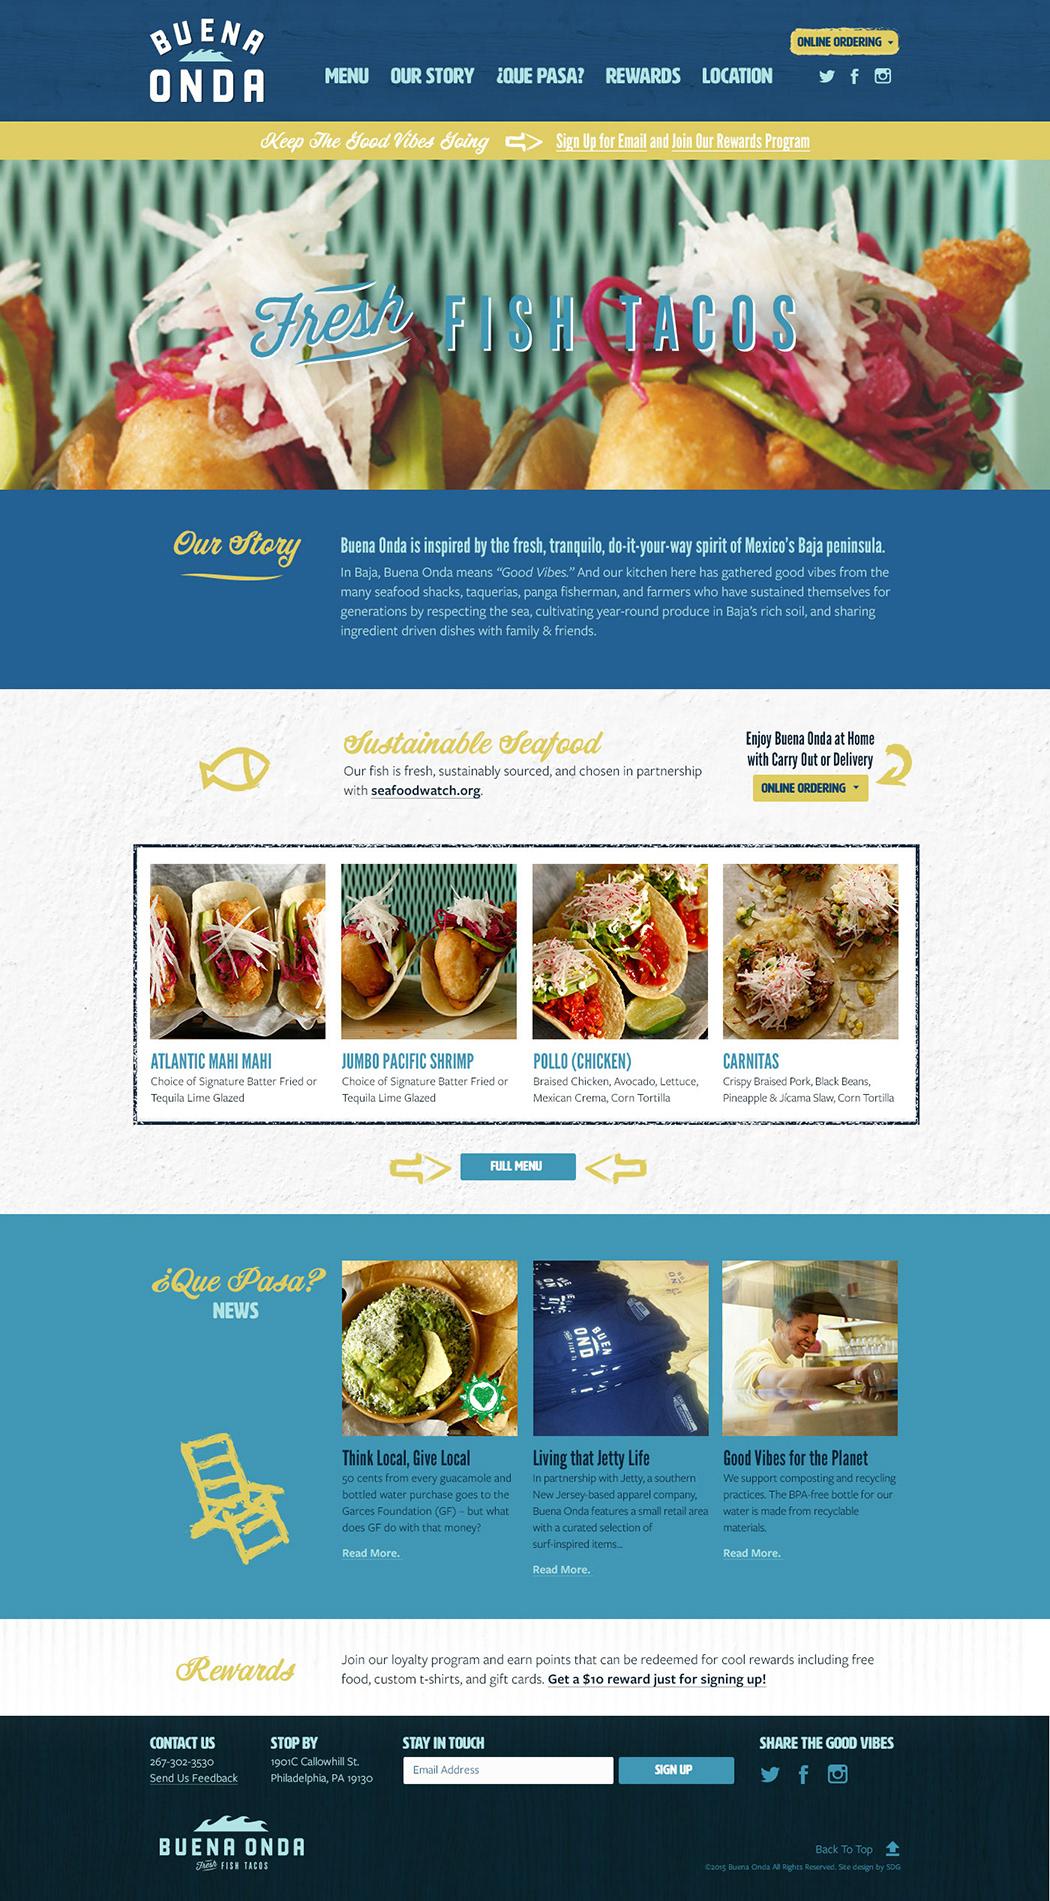 Jose Garcess Buena Onda Tacos Philadelphia PA Website Design Buenaondatacos